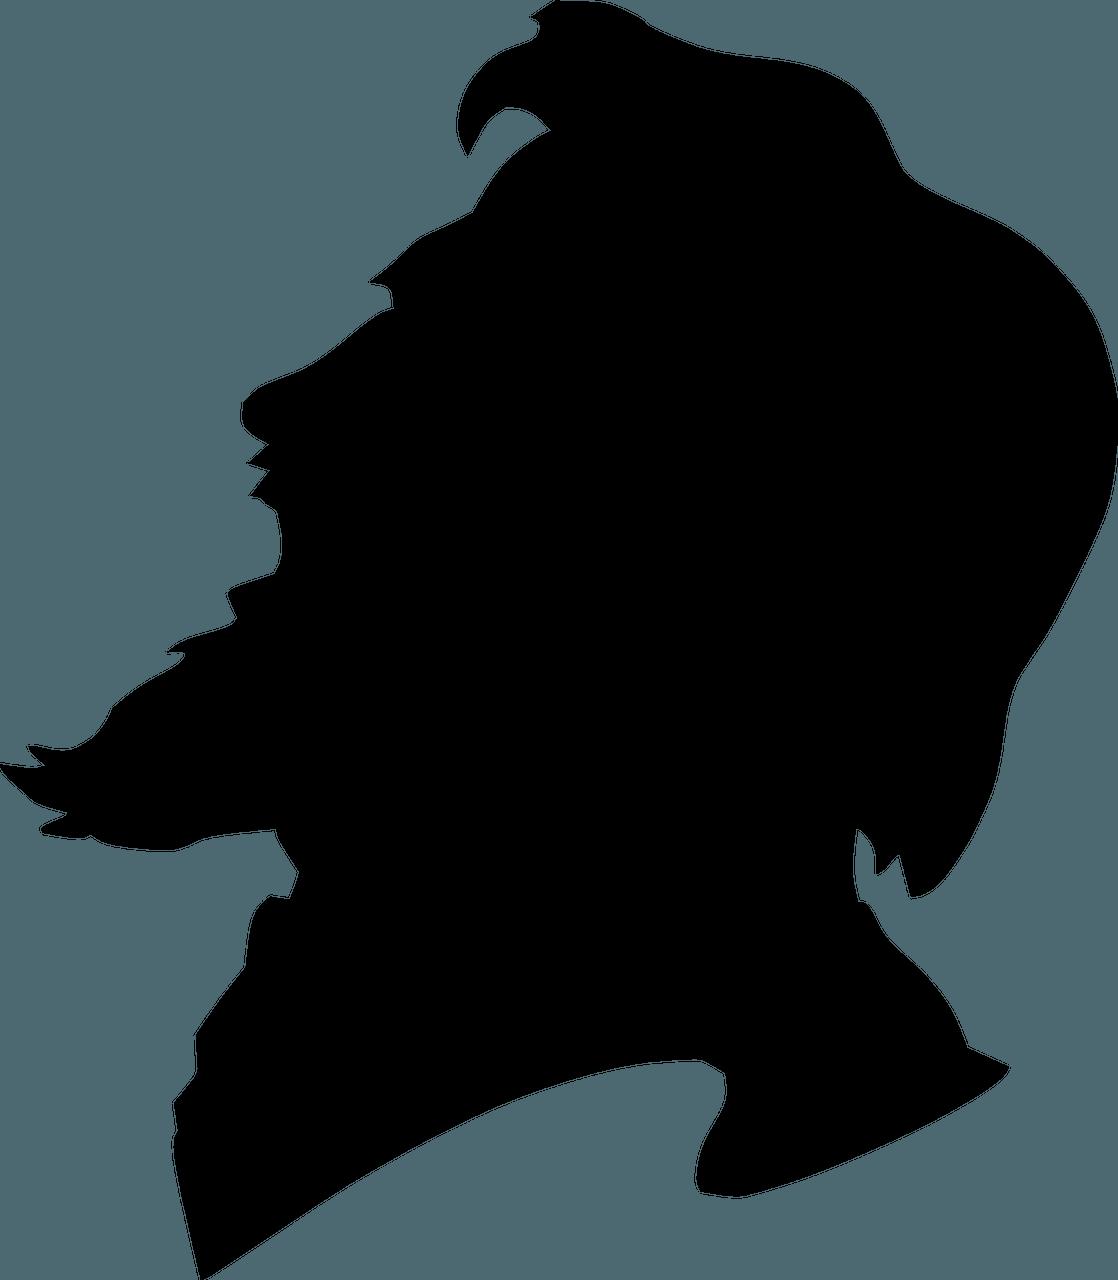 Beard clipart islamic Duck to Style & A